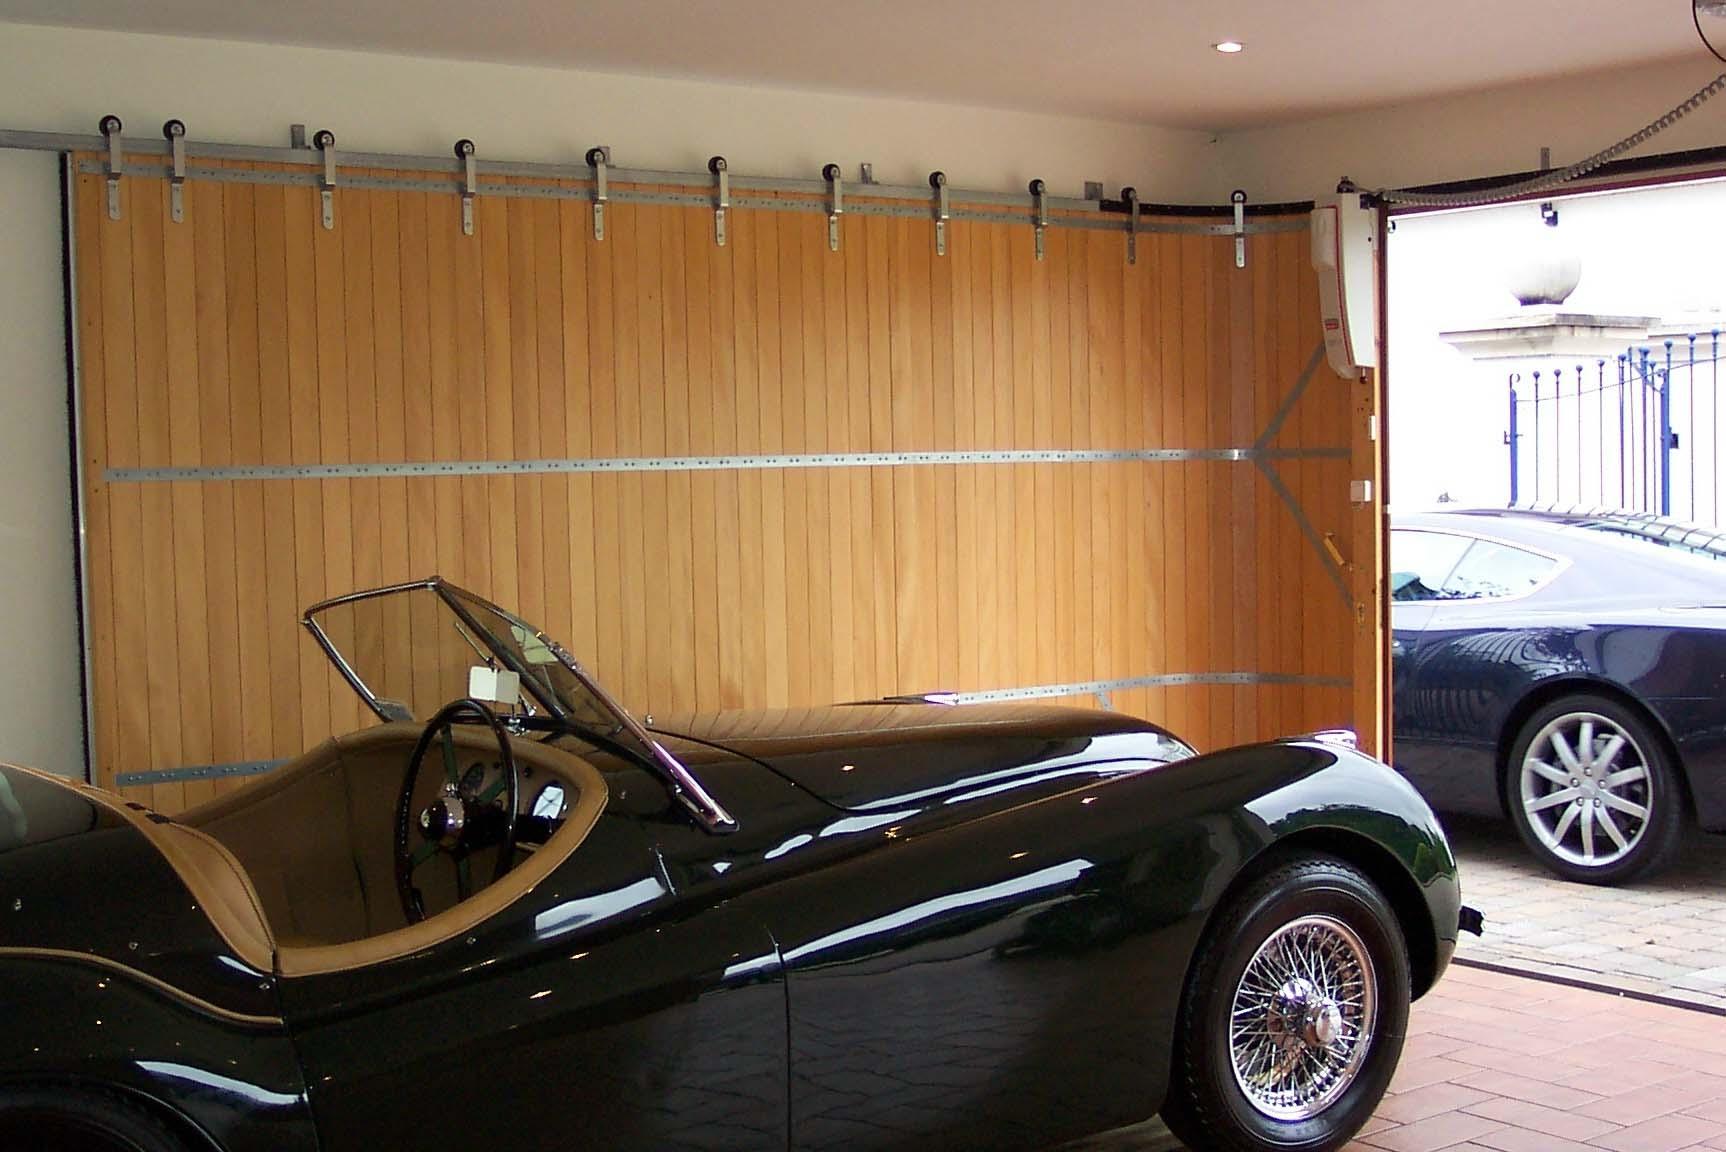 Sliding Garage Door Bottom Trackrundum garage doors side sliding rundum original